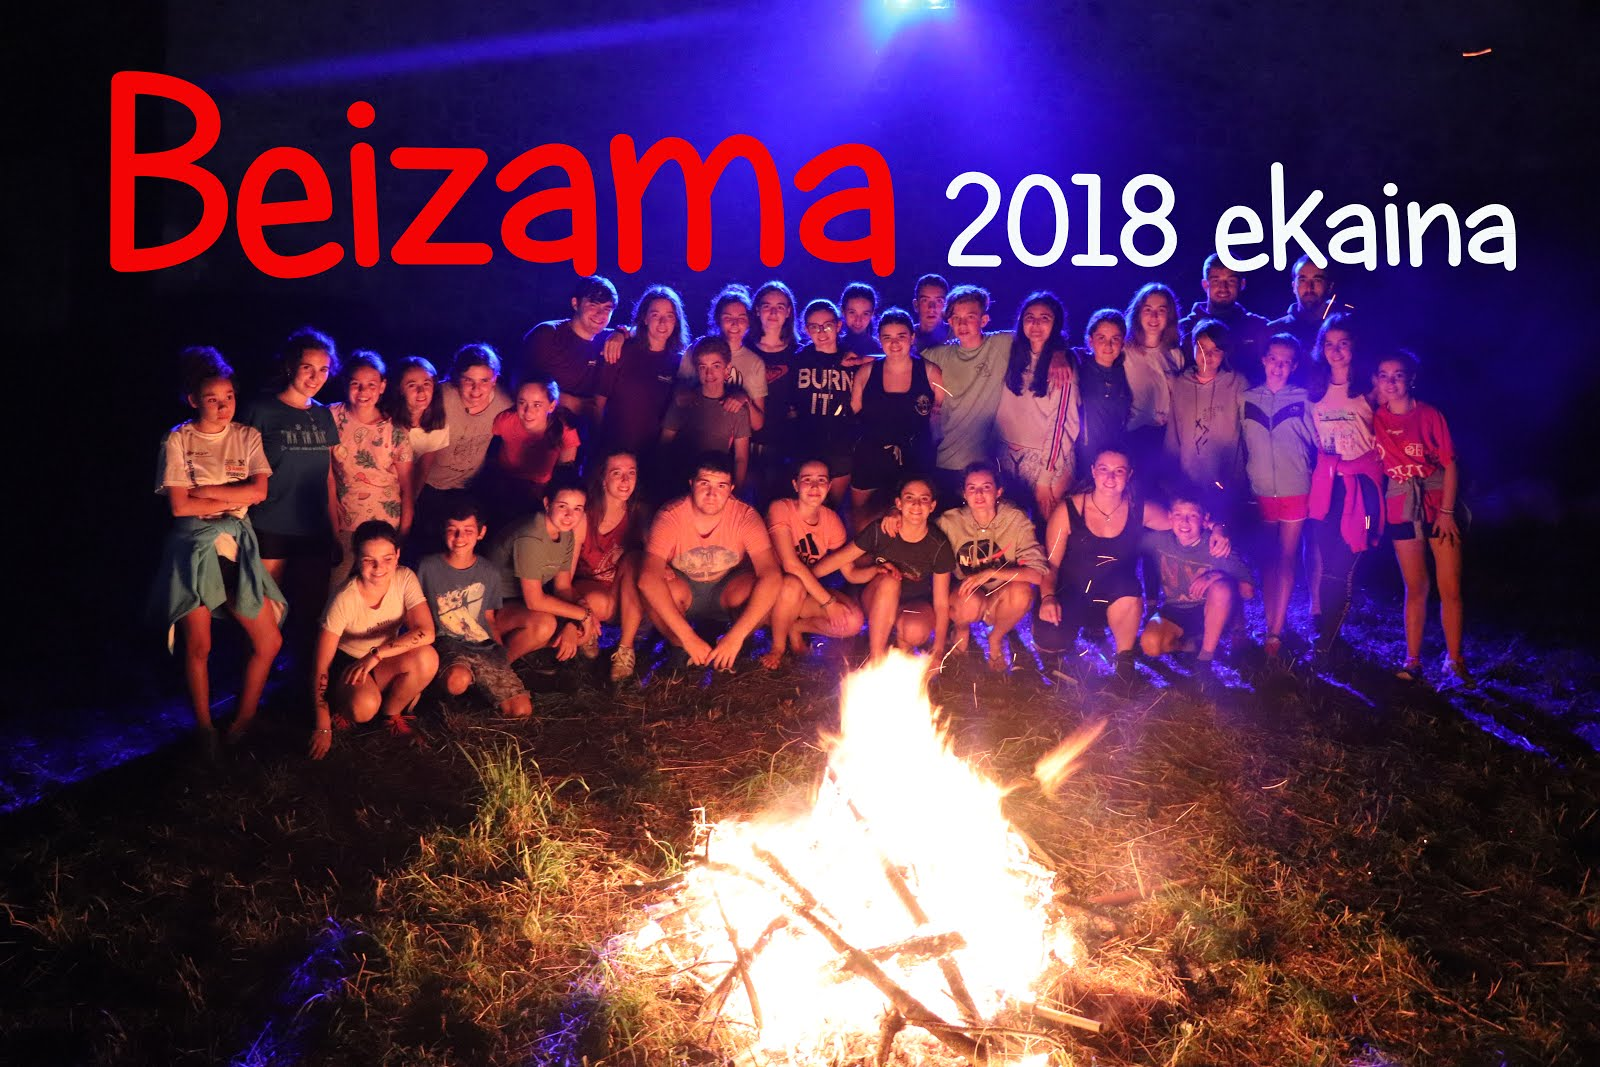 Beizama 2018 udalekua